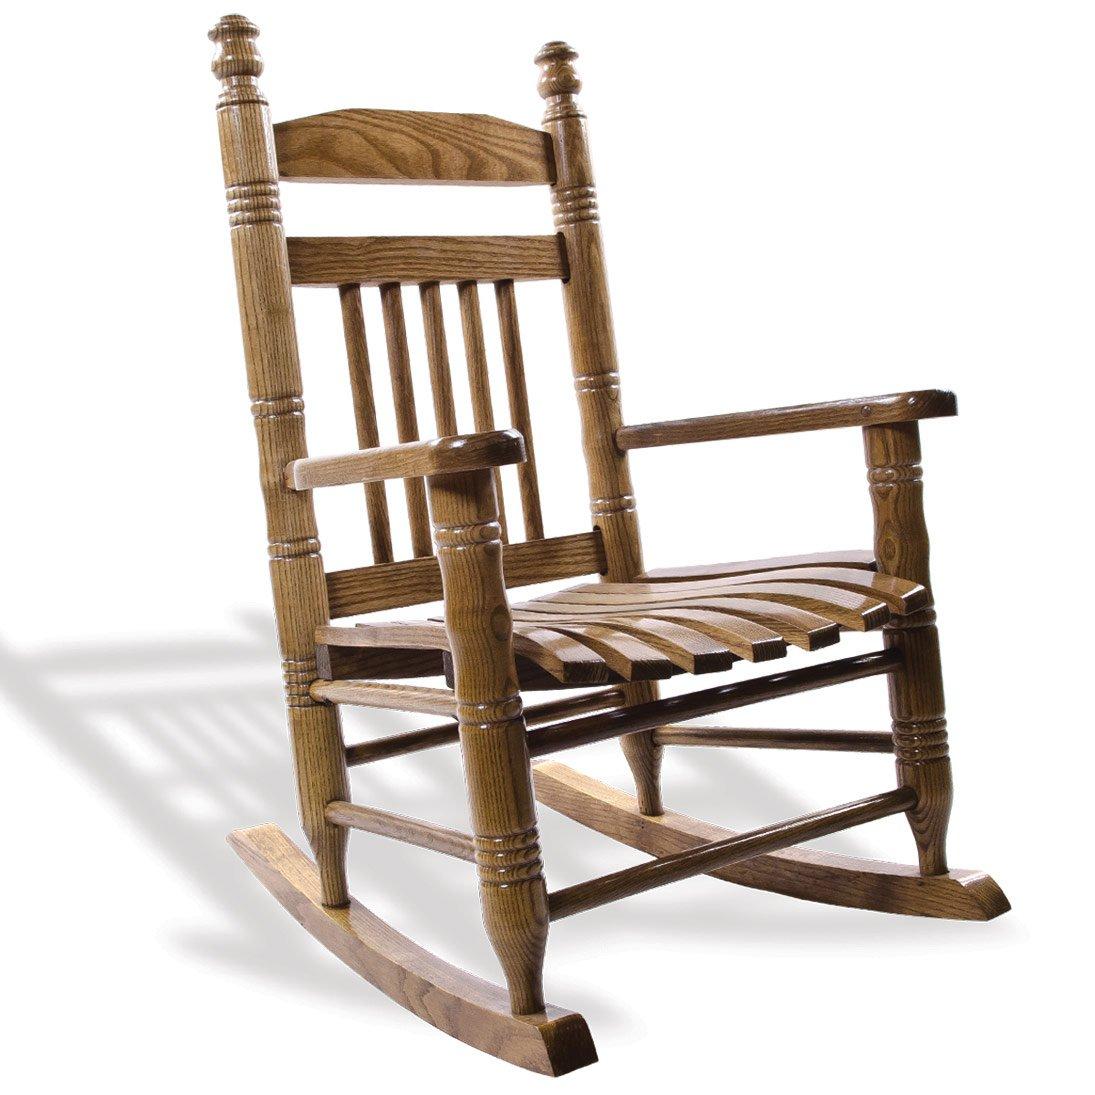 Charmant Slat Child Rocking Chair   Hardwood